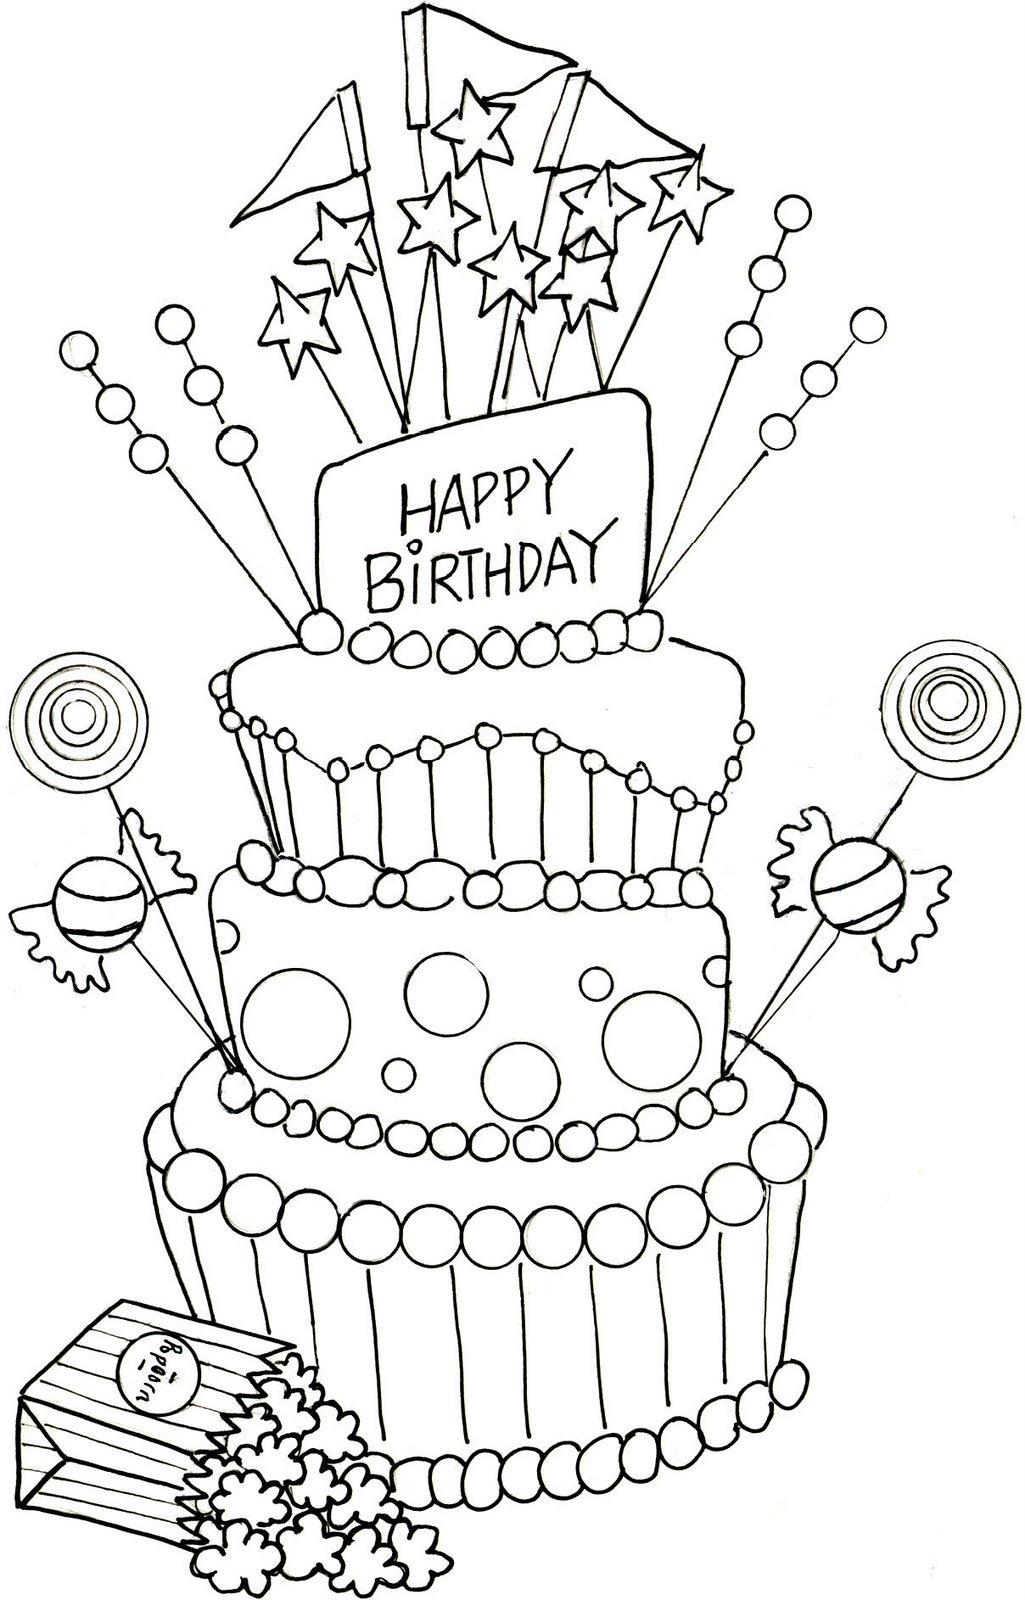 Happy Birthday Cake Drawing At Getdrawings